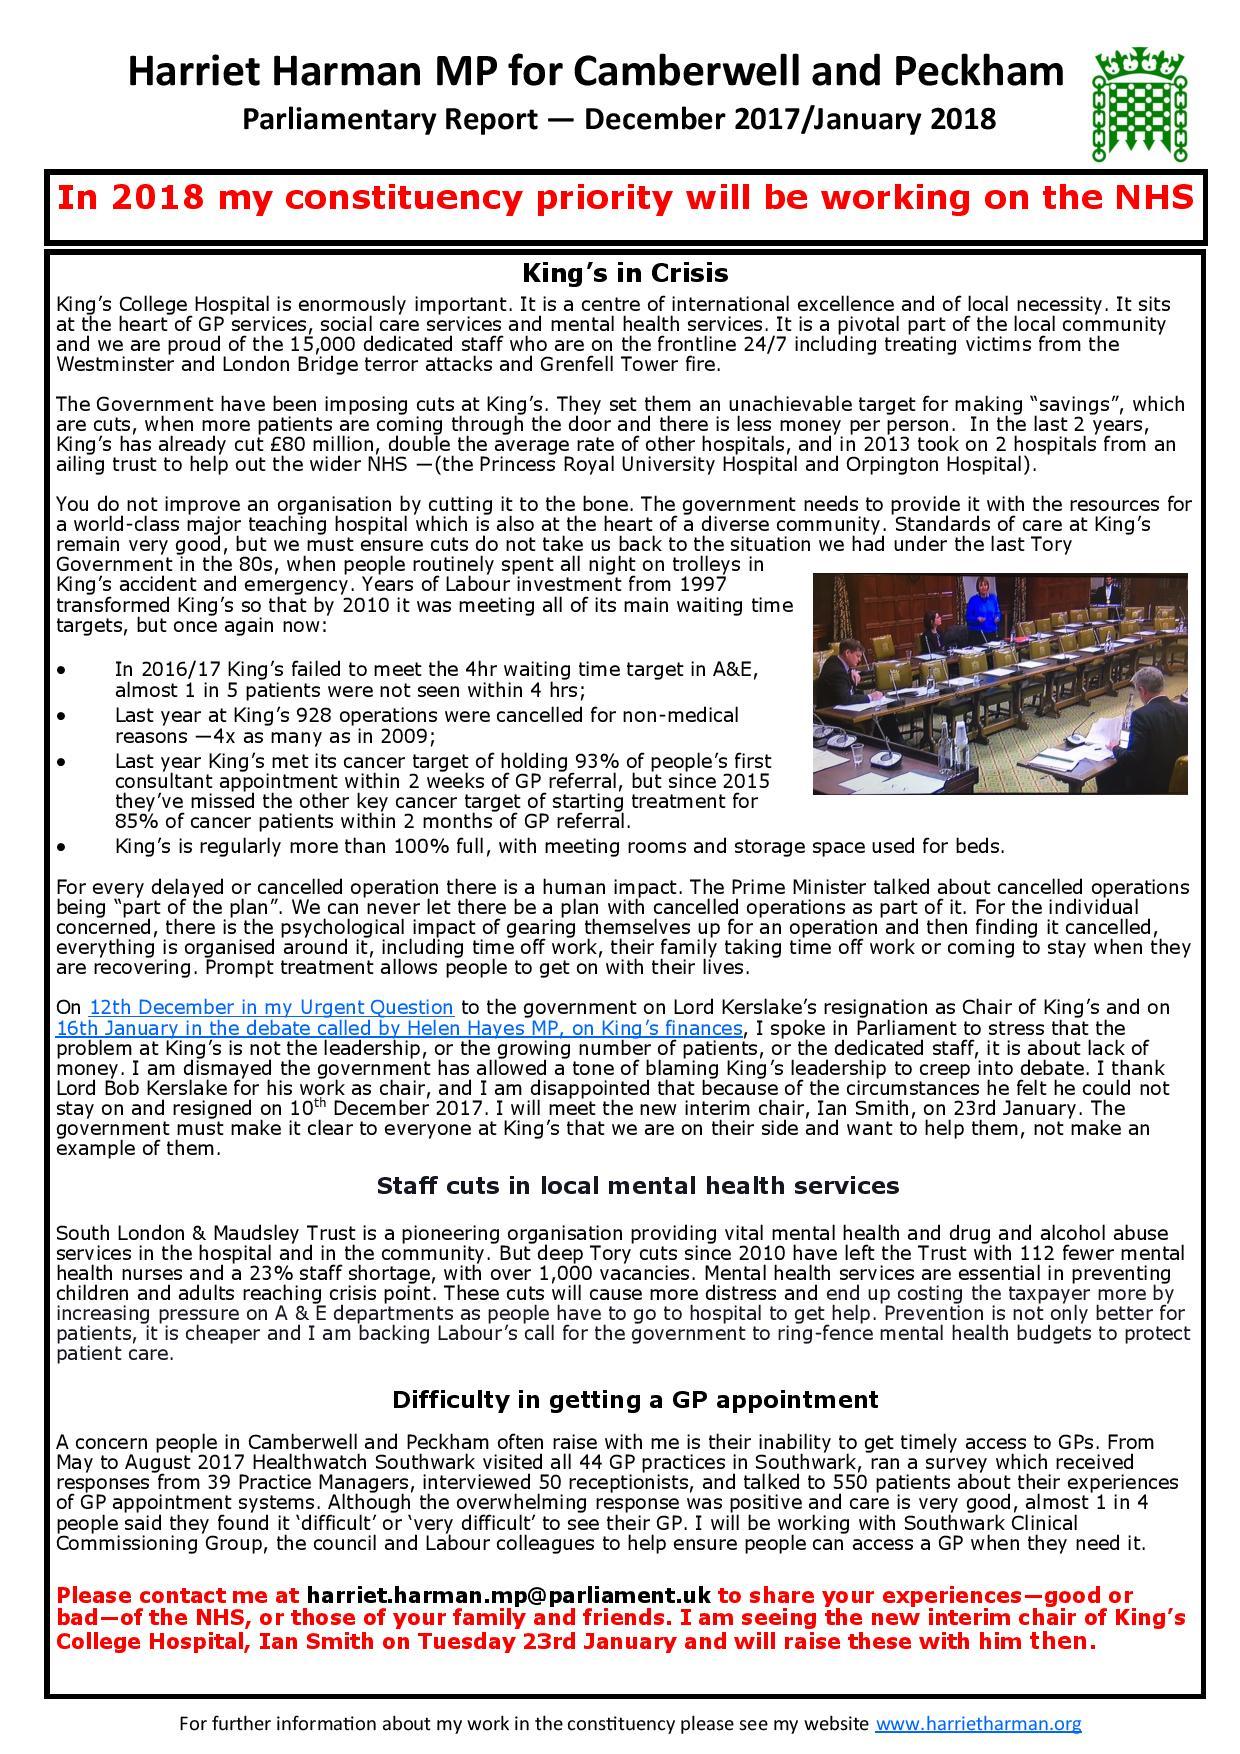 GC_Report_Dec_-_Jan_17-18_HH-page-001.jpg